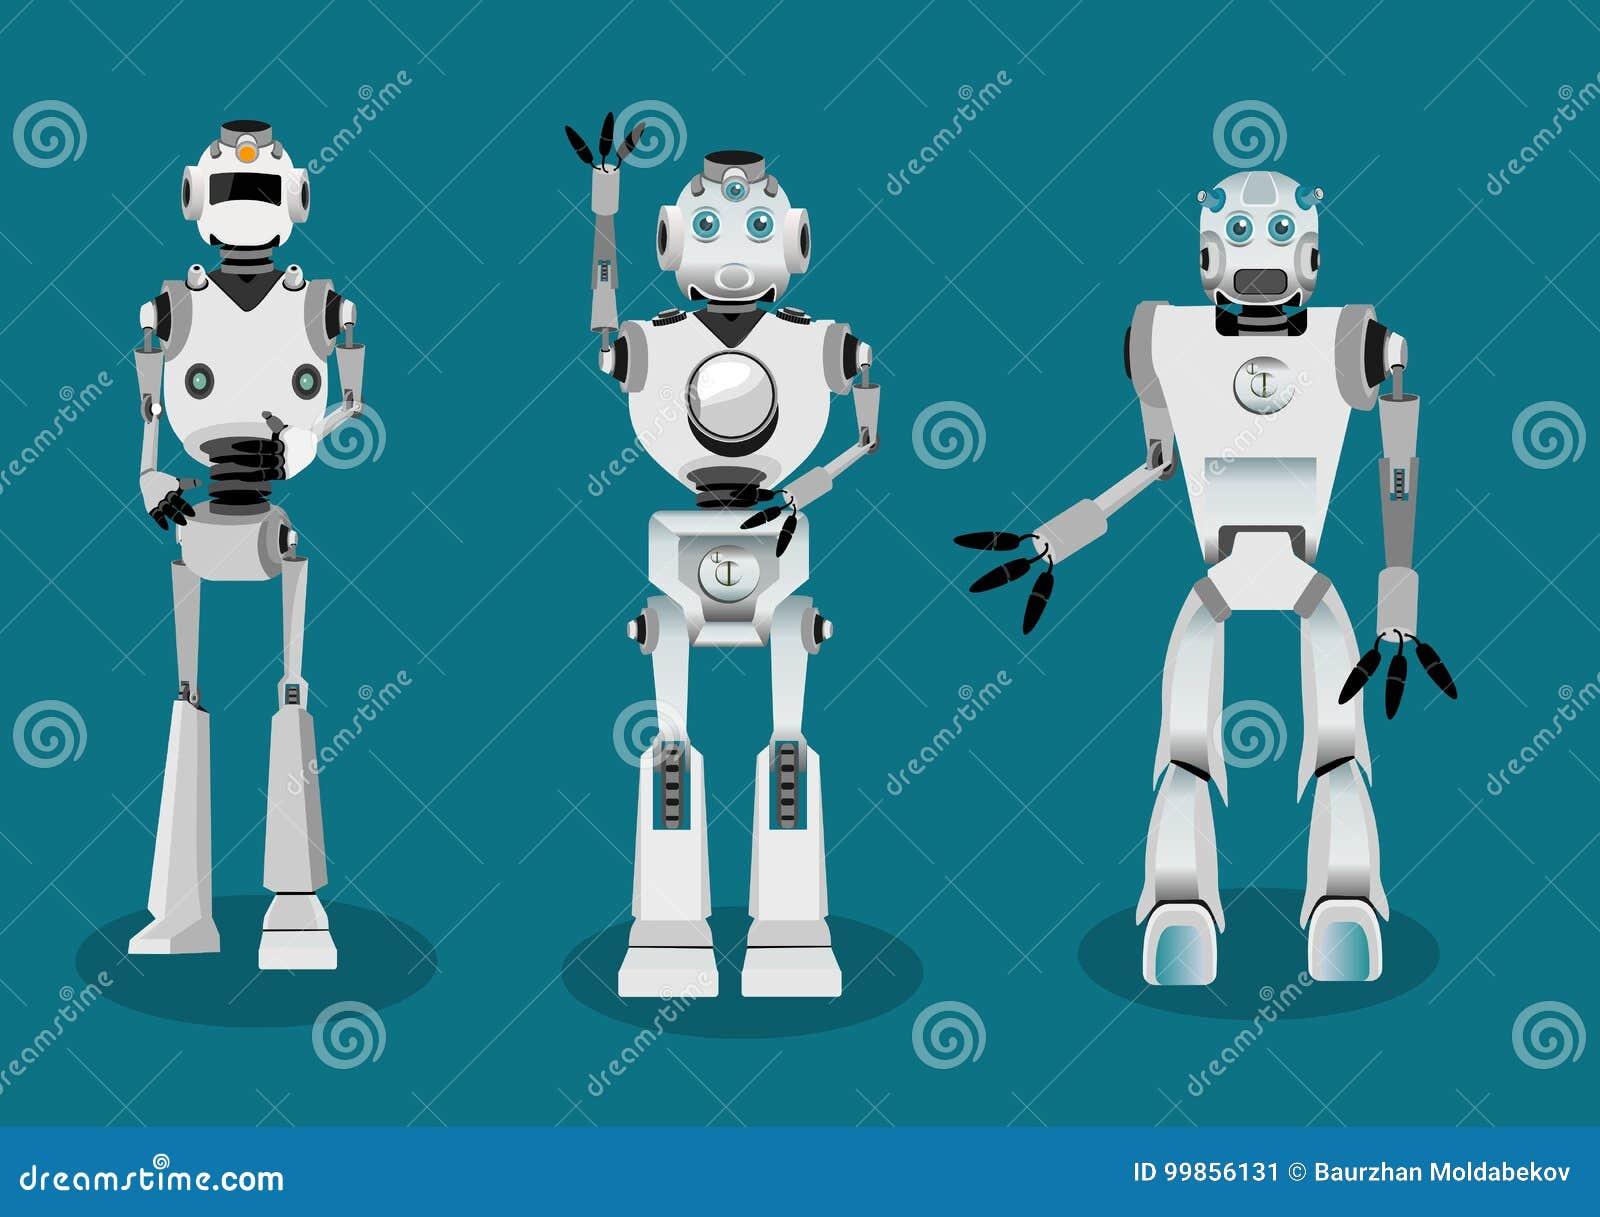 Satz des Androidsrobotercharakters in den verschiedenen wechselwirkenden Haltungen